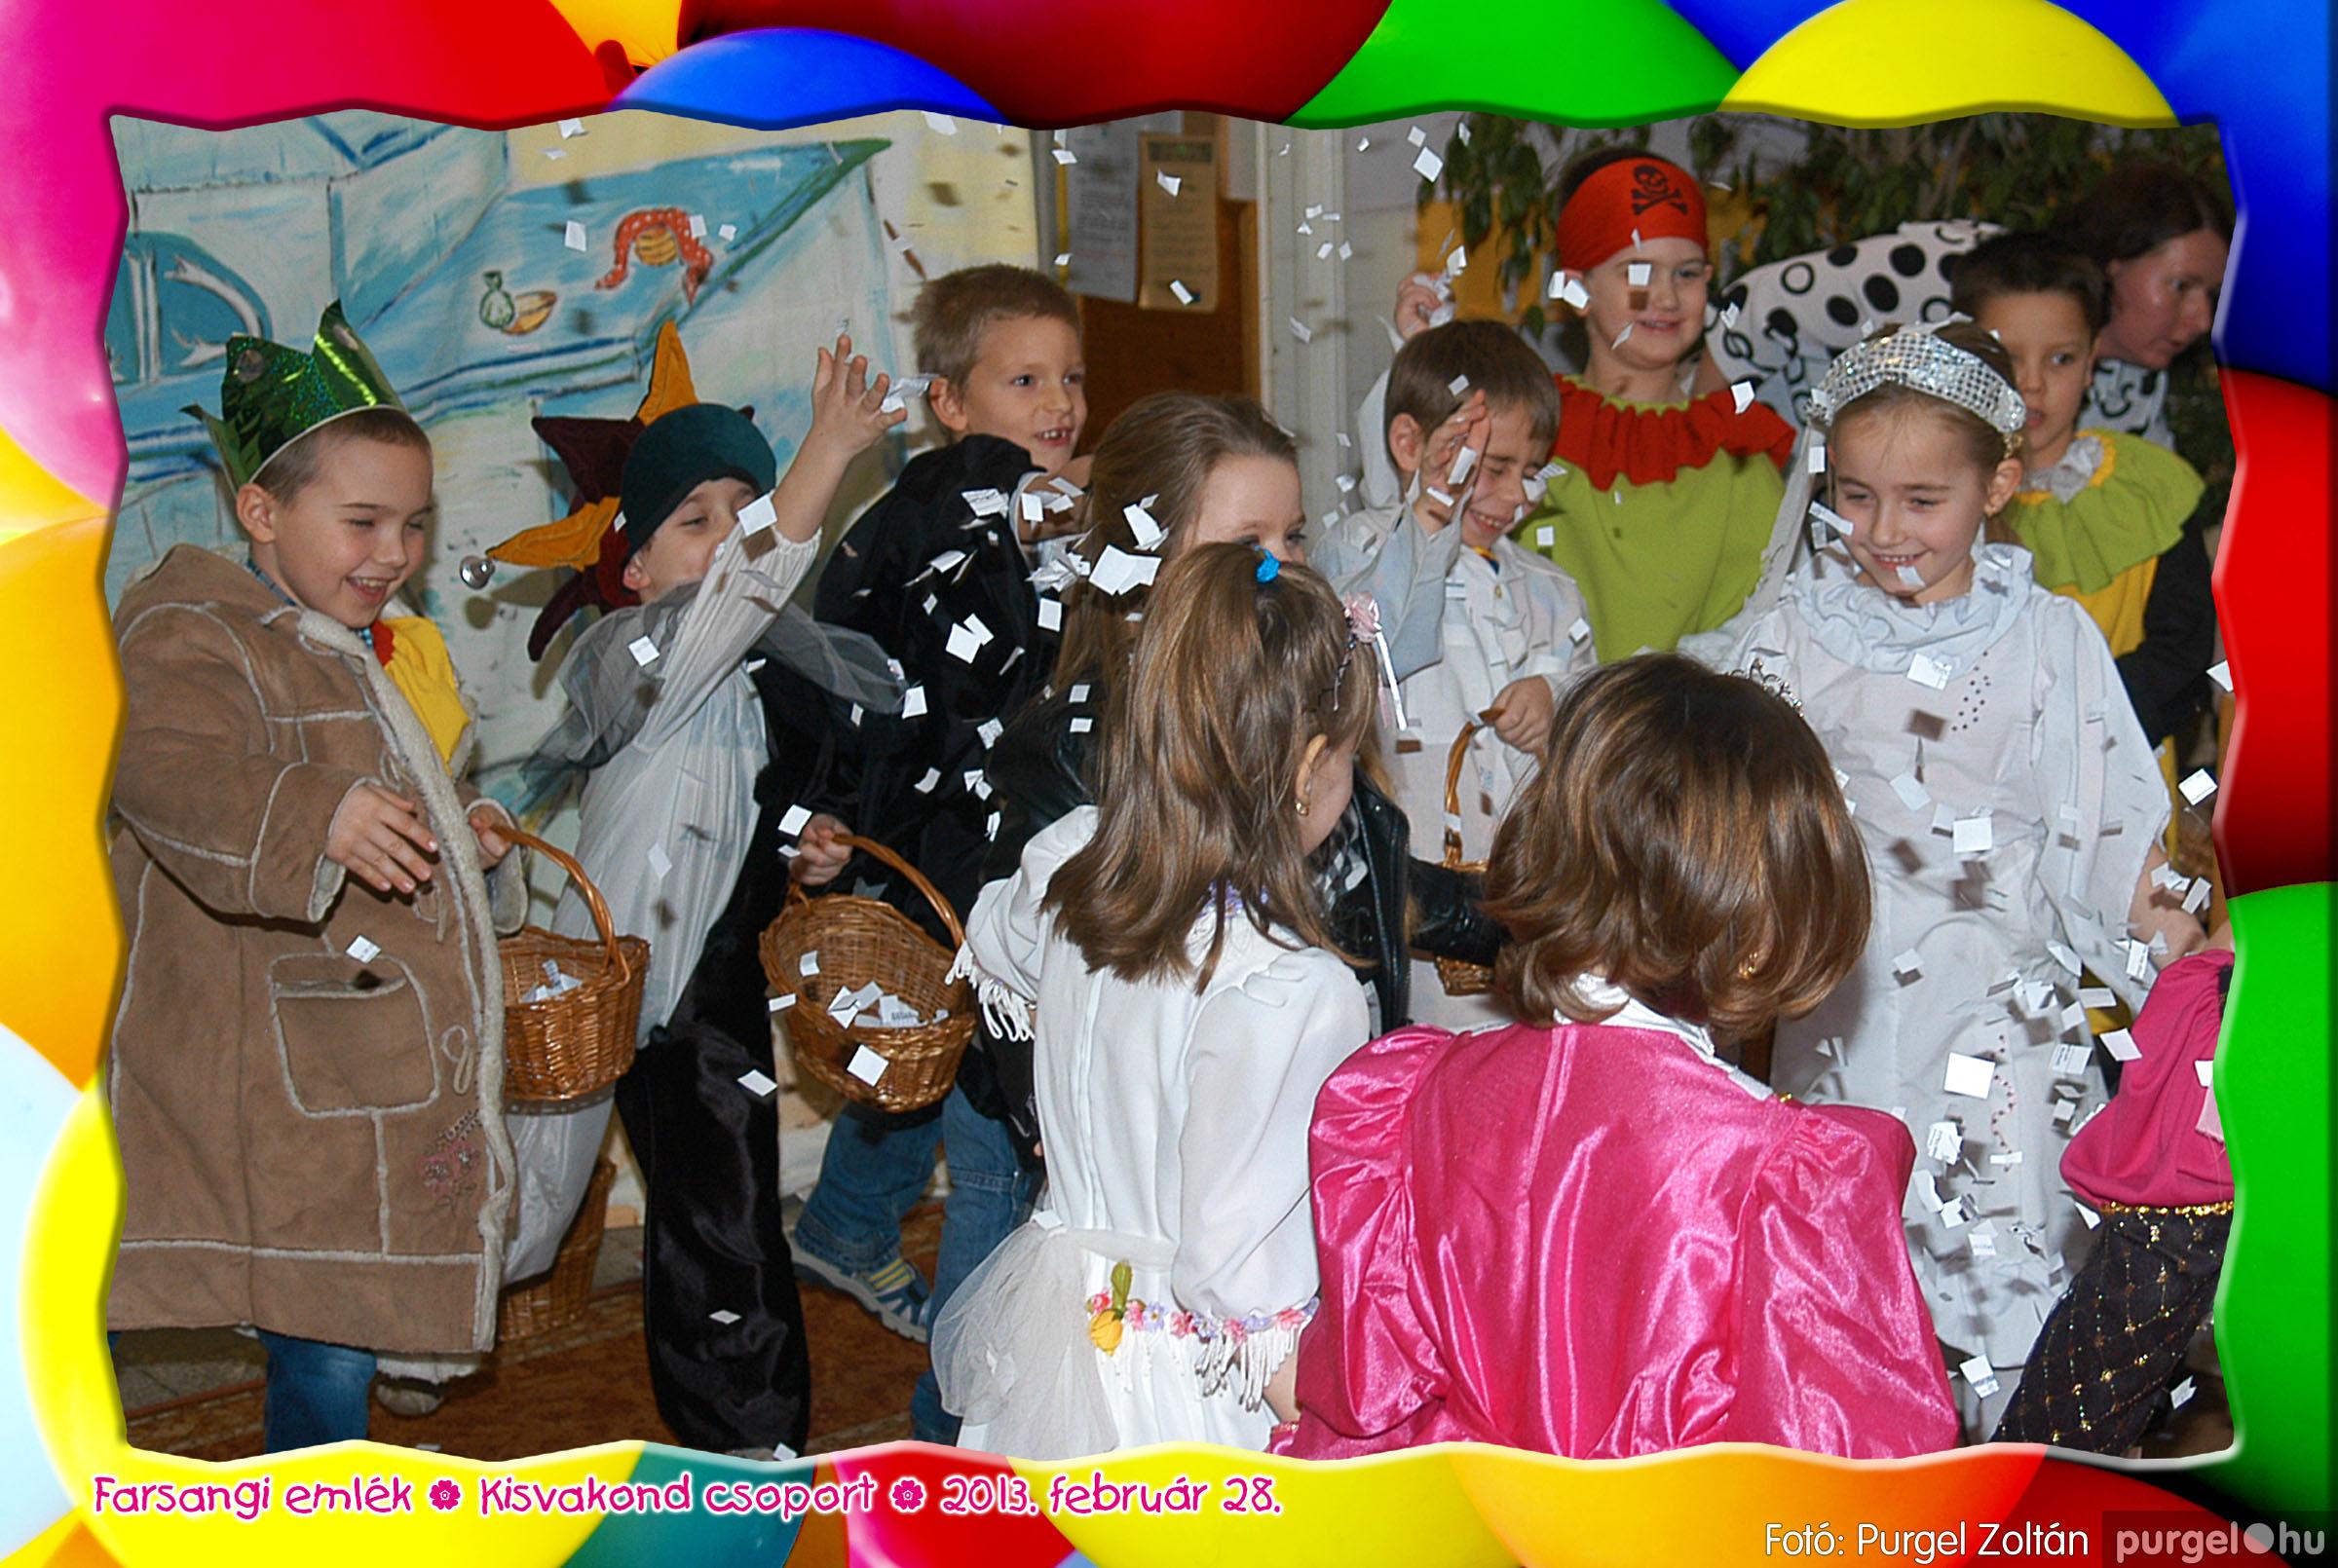 2013.02.28. 202 Kurca-parti Óvoda farsang 2013. - Kisvakond csoport - Fotó:PURGEL ZOLTÁN© 426.jpg